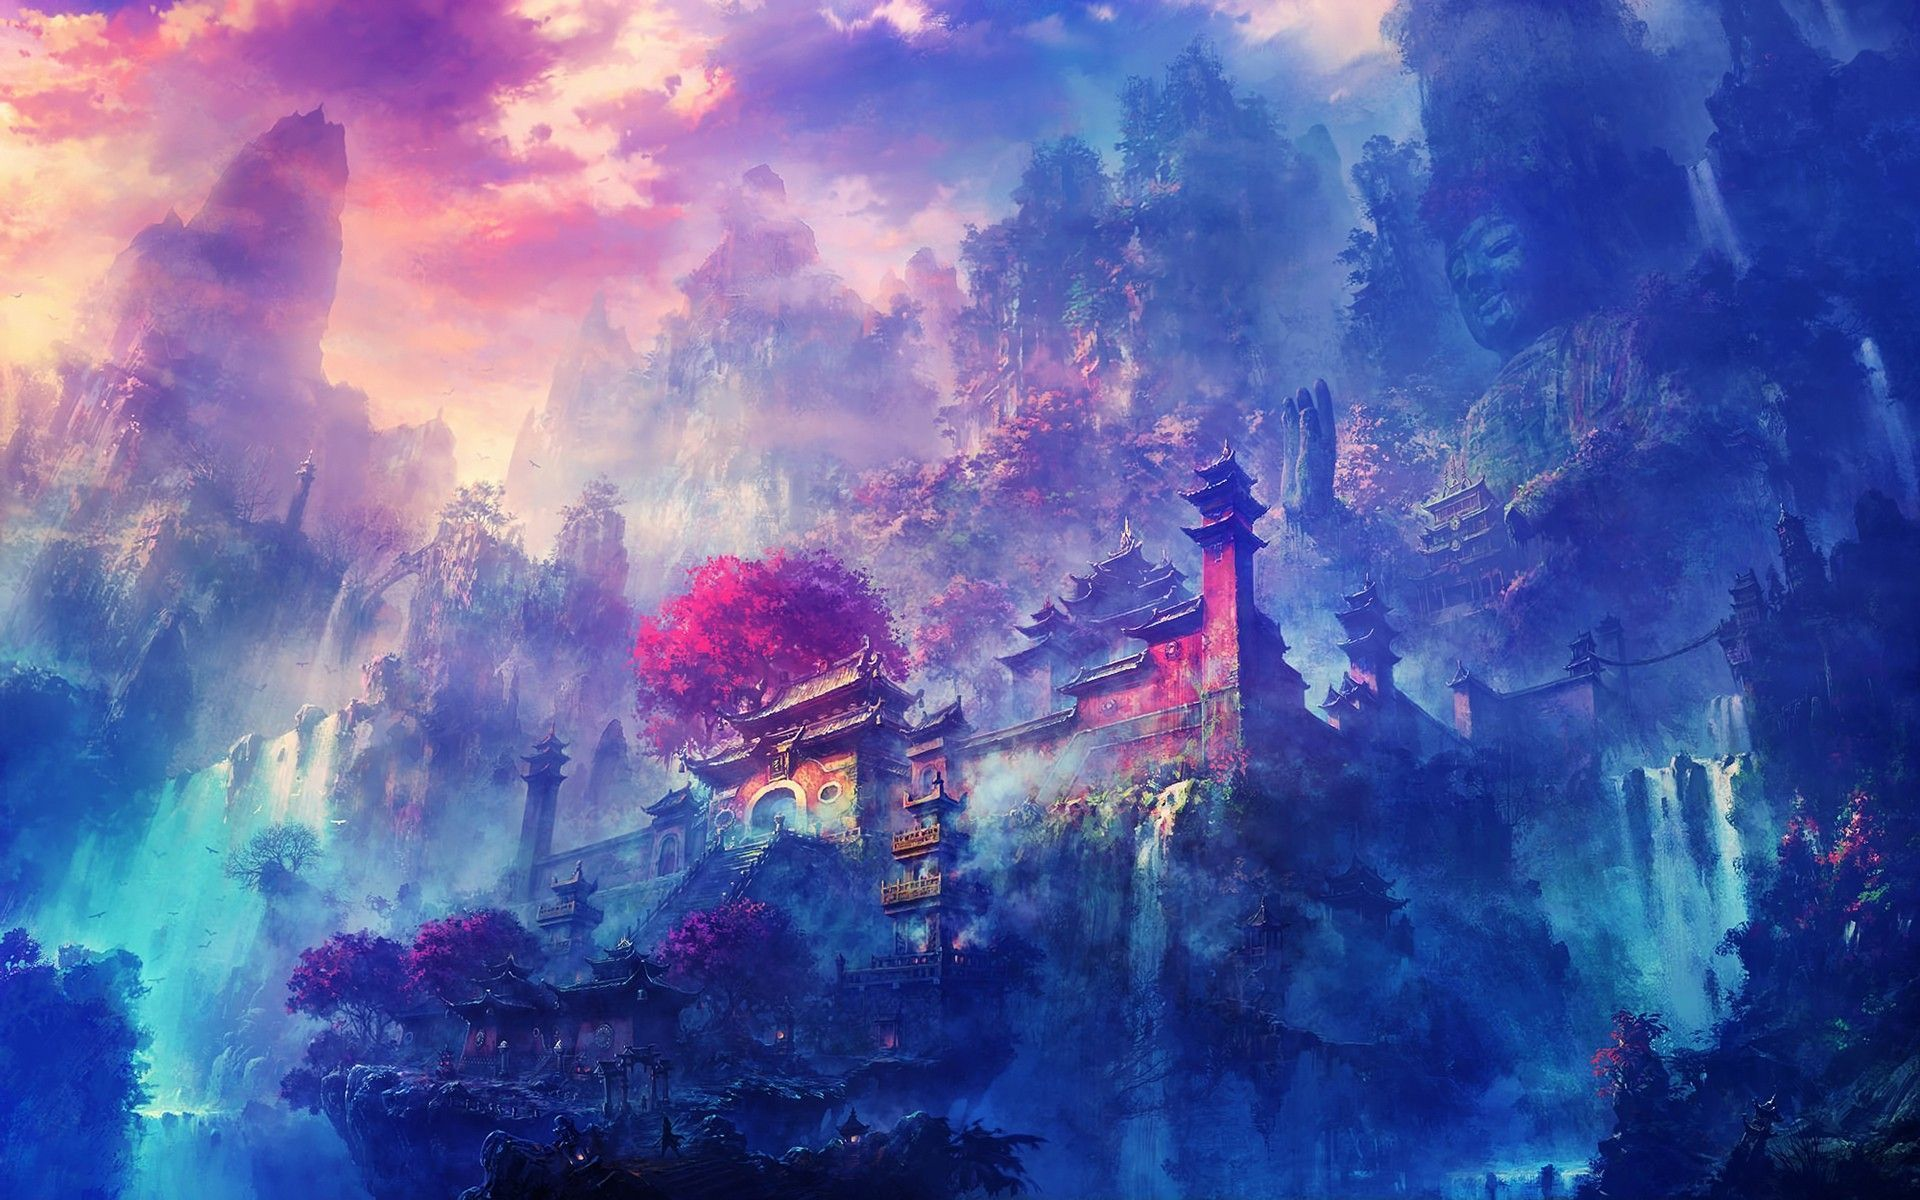 Castle Computer Wallpapers Desktop Backgrounds 1920x1200 Id 318723 Anime Scenery Anime Scenery Wallpaper Scenery Wallpaper